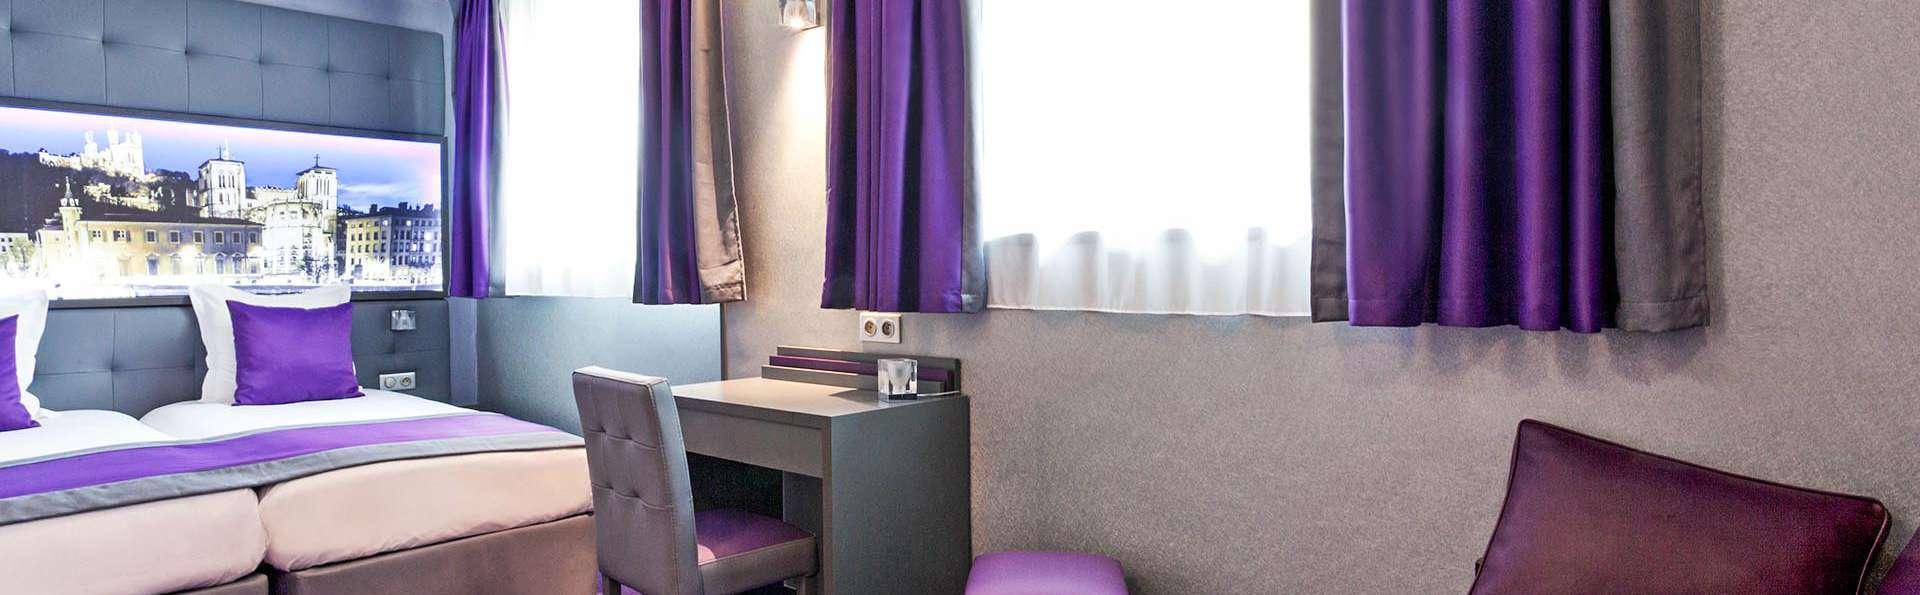 Hôtel des Savoies - EDIT_Maranatha_06.jpg